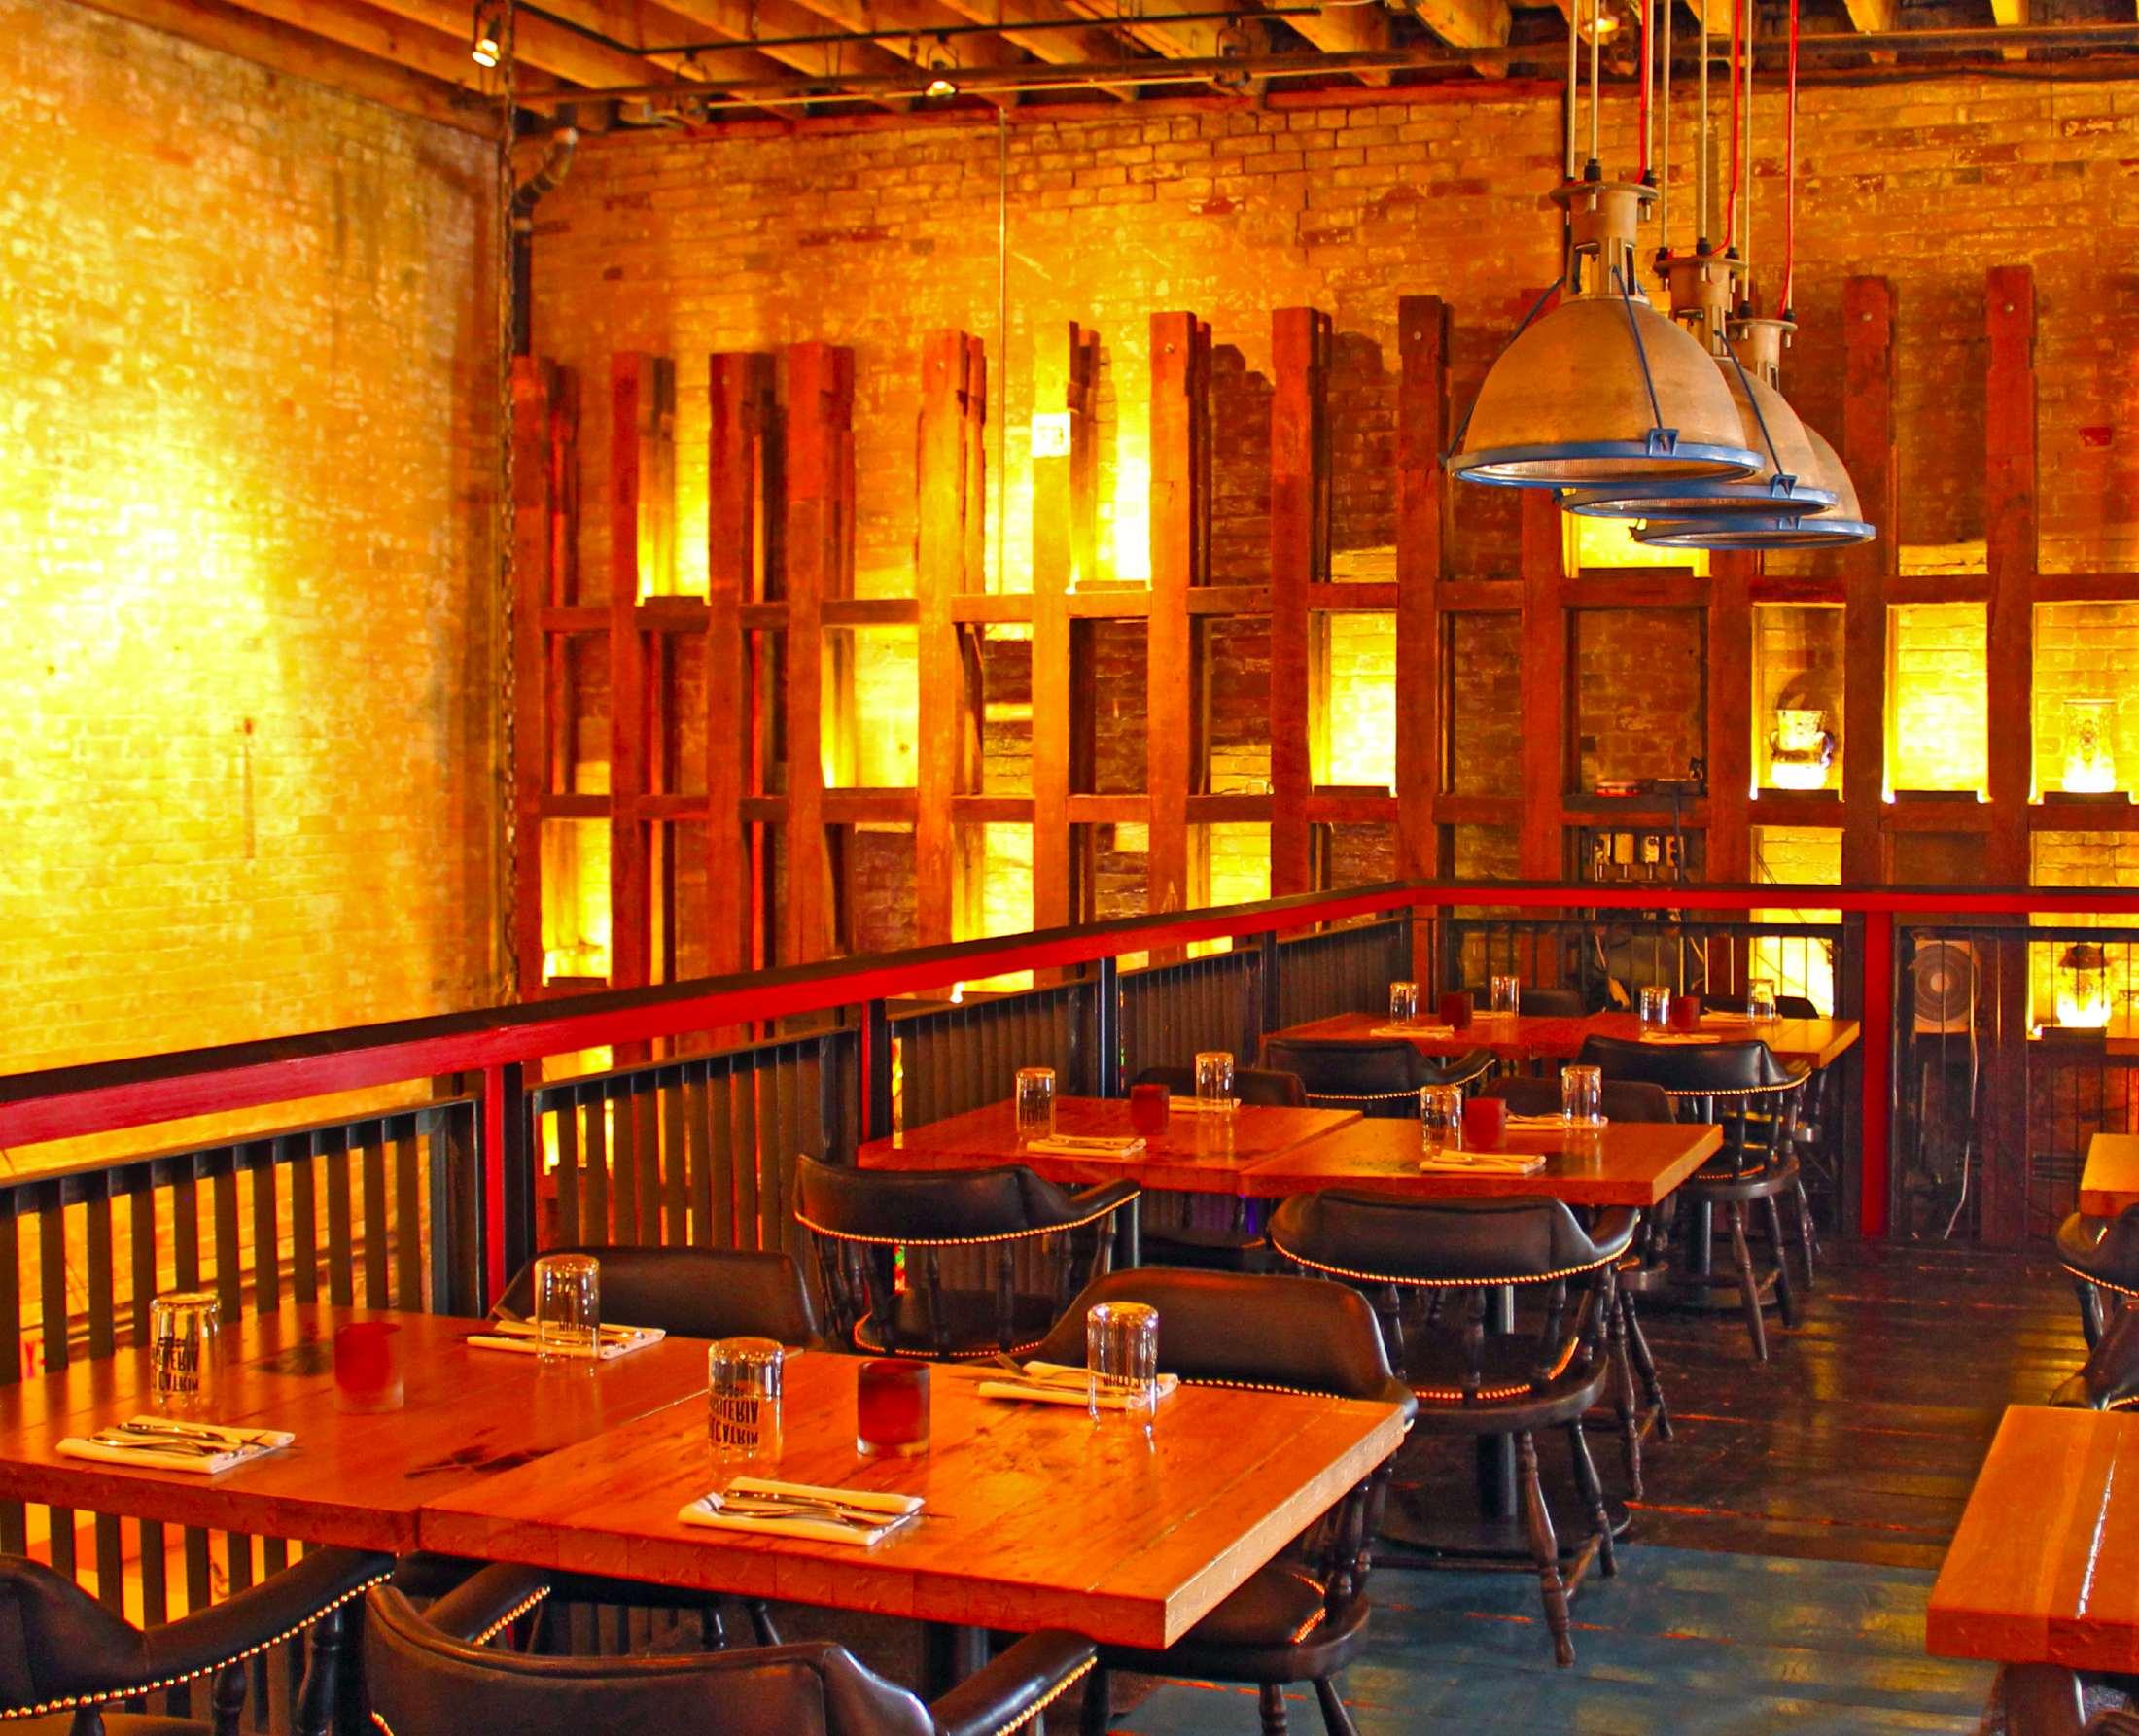 El Catrin Restaurant - Focal Journey